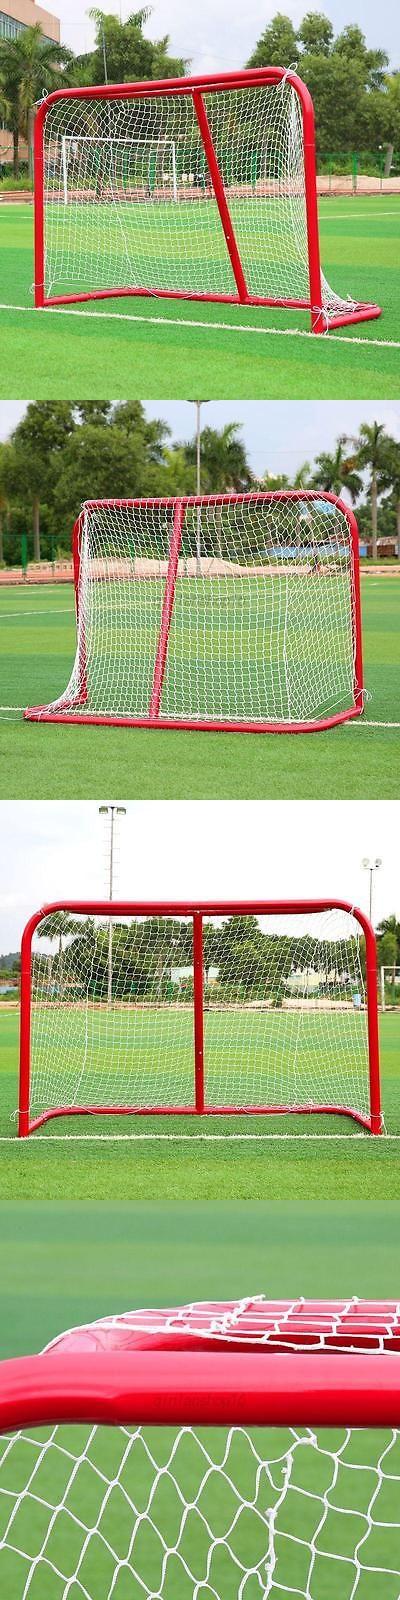 Goals and Nets 165936: Pro Roller Steel Hockey Goal Net Folding Foldable Soccer Ball Street Outdoor -> BUY IT NOW ONLY: $179 on eBay!